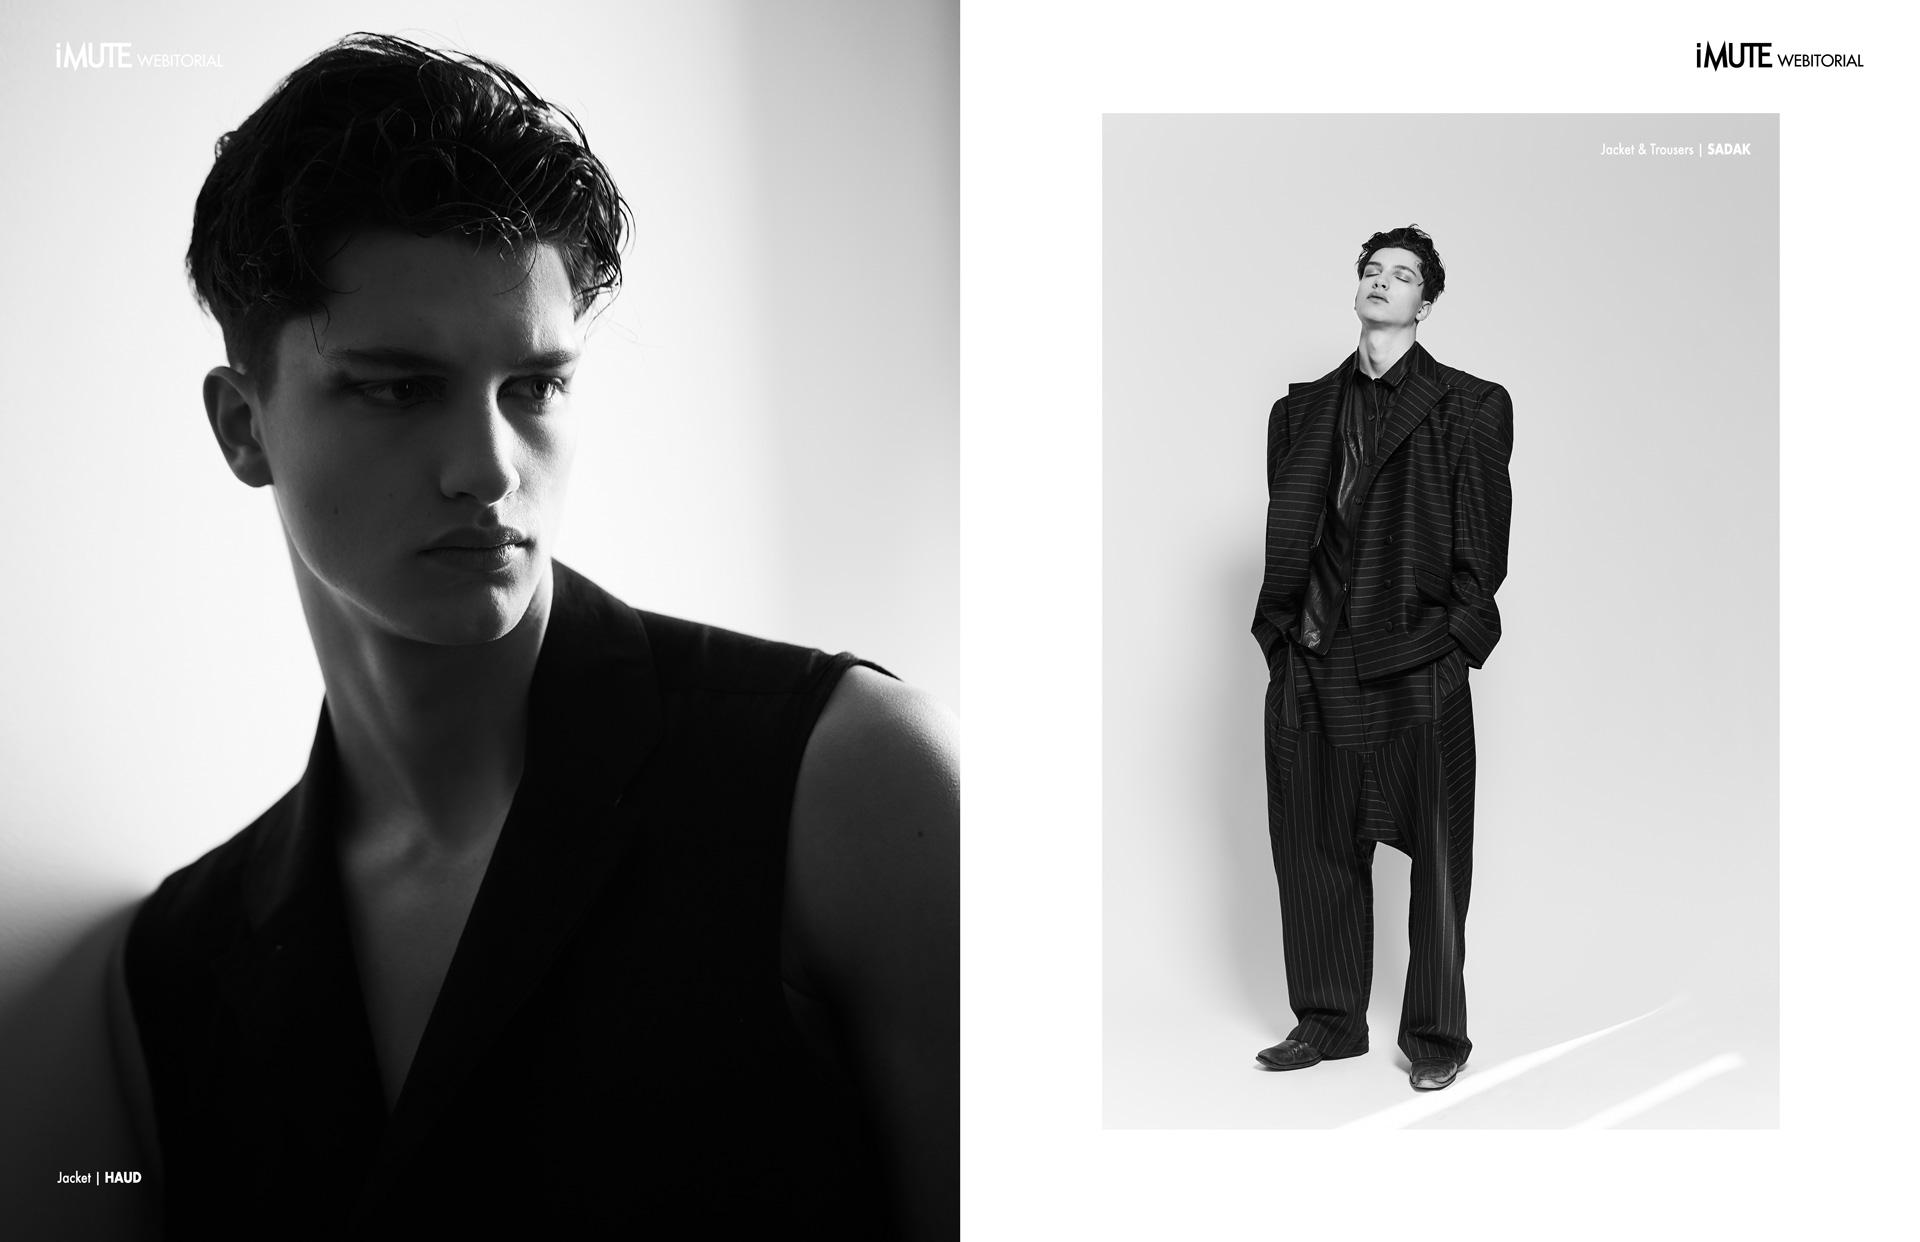 ROMAIN webitorial for iMute Magazine4 Photographer | Anaïs Novembre Model | ROMAIN HAMDOUS @ 16MEN Stylist | Marie Revelut Makeup & Hair | YANGSUN SEO